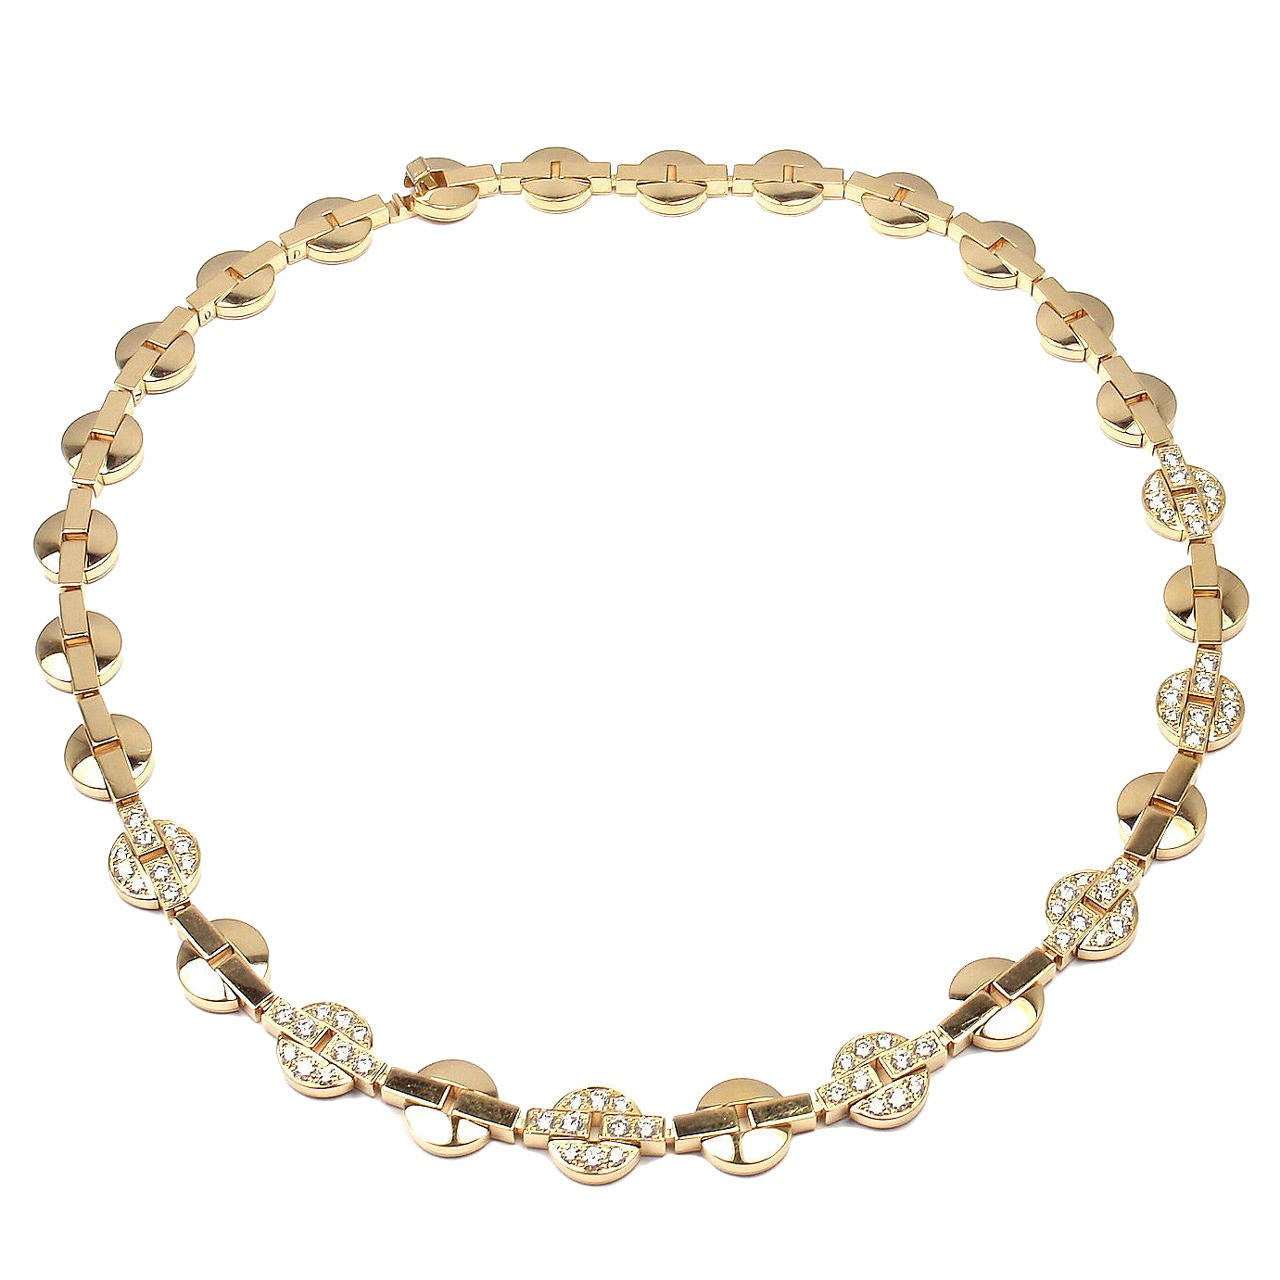 Cartier Himalia Diamond Gold Choker Necklace